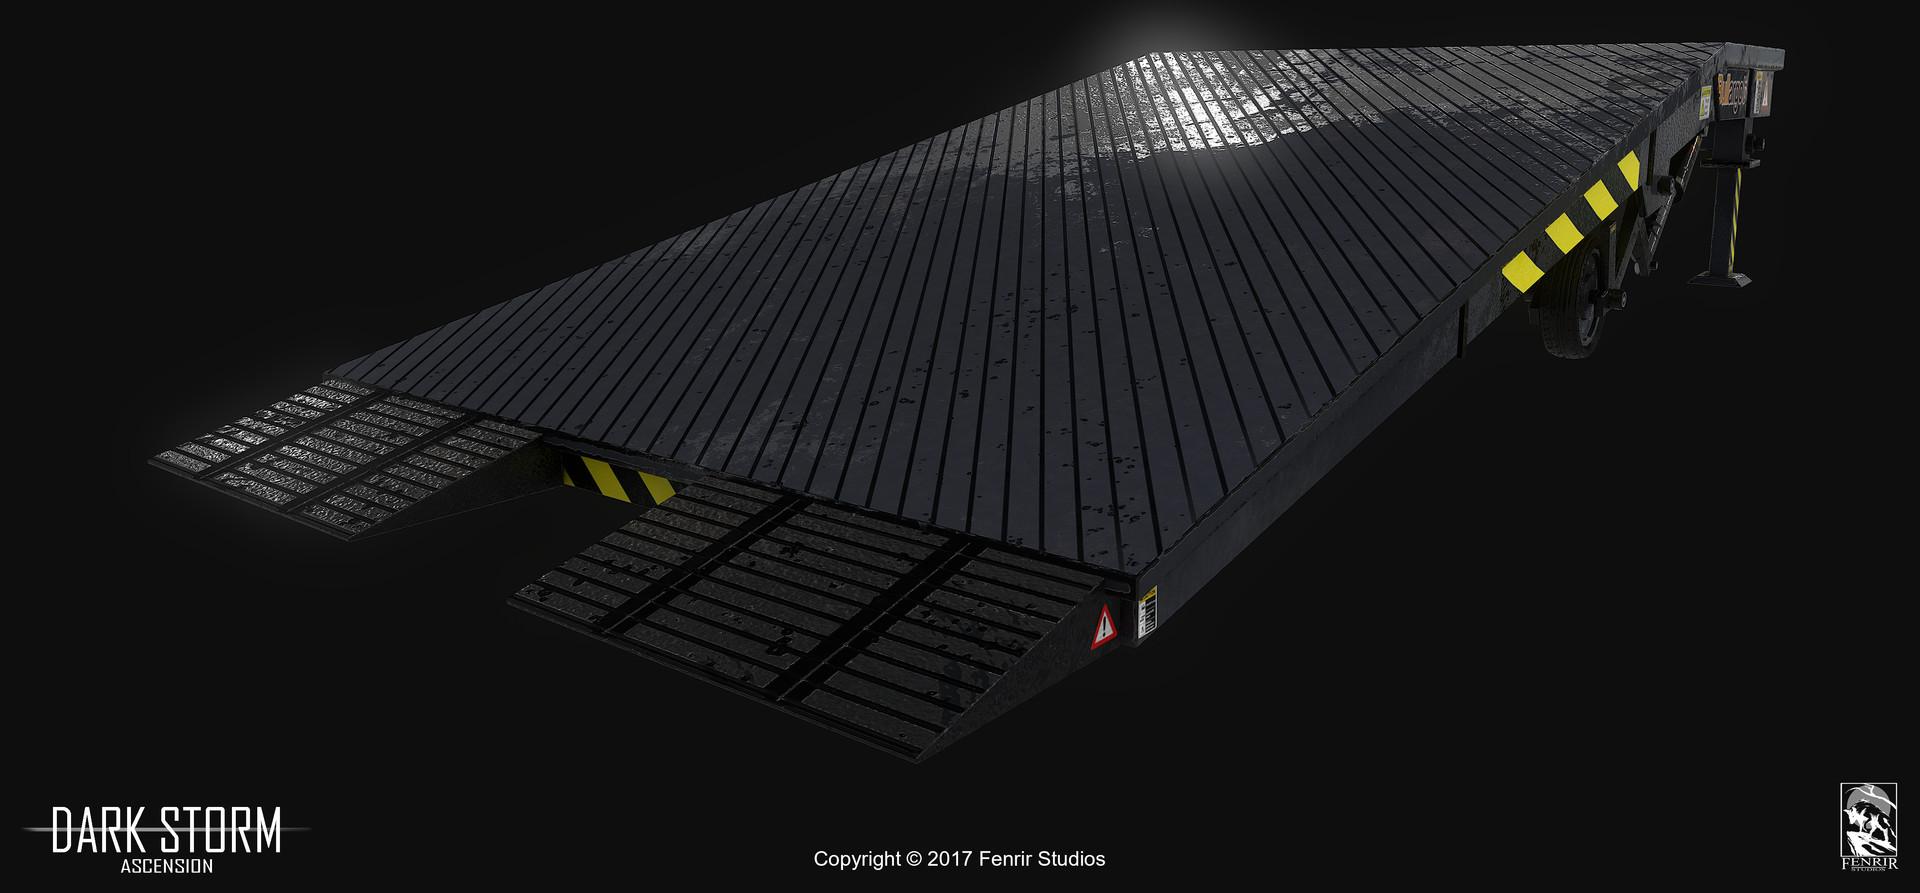 Nikolaos kaltsogiannis cargo ramp presentation 06